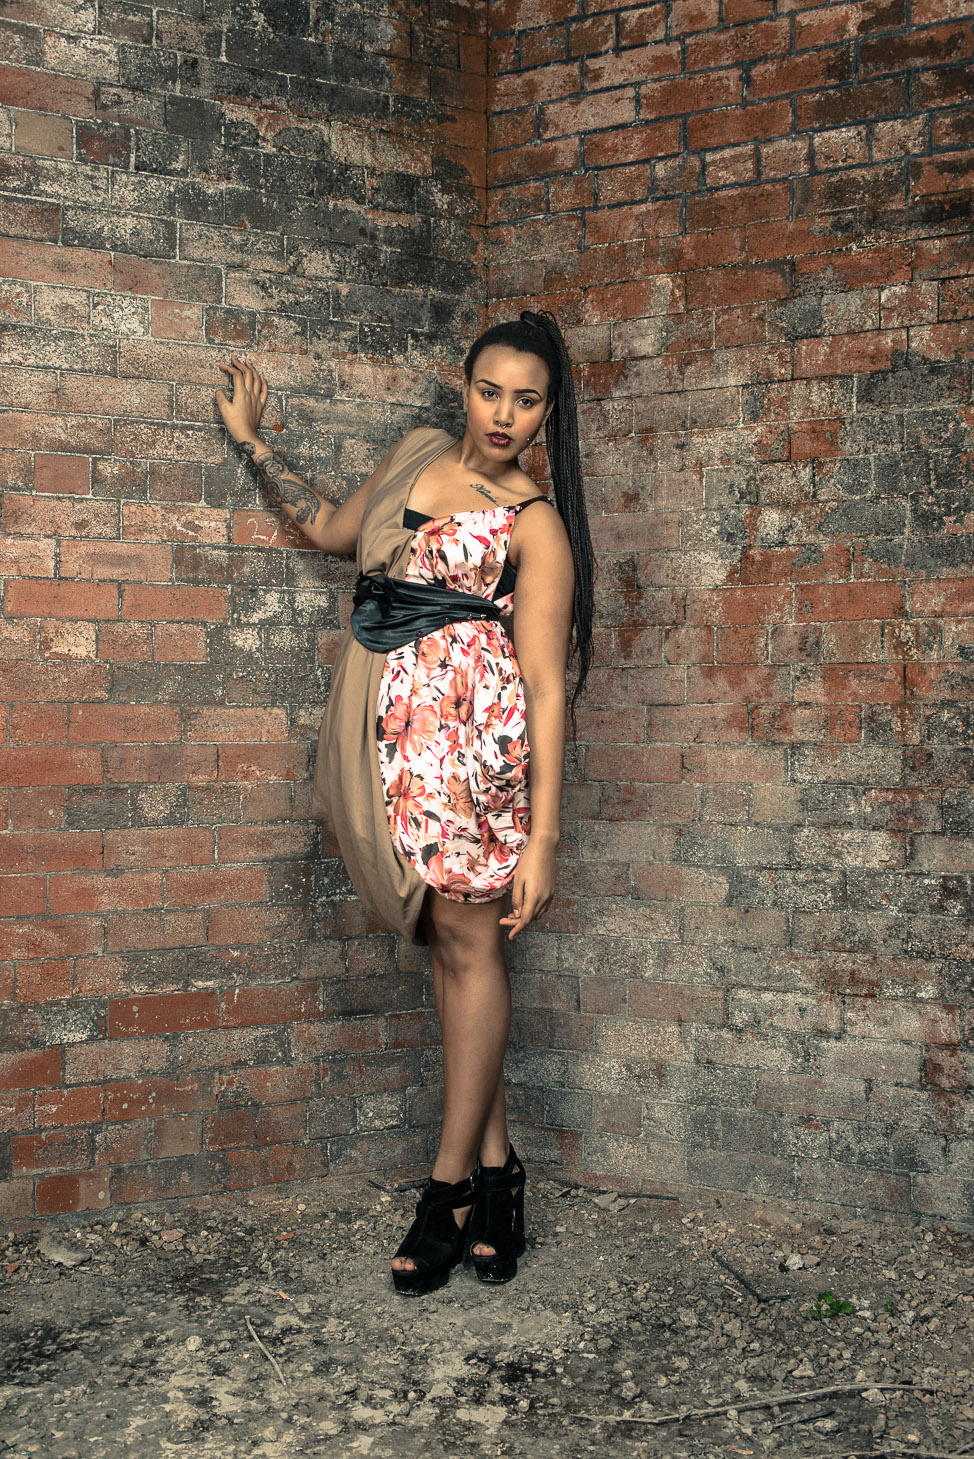 zaramia-ava-zaramiaava-leeds-fashion-designer-ethical-sustainable-tailored-minimalist-burgundy-versatile-drape-dress-flower-nude-print-belt-wrap-cowl-styling-bodysuit-womenswear-models-photoshoot-9